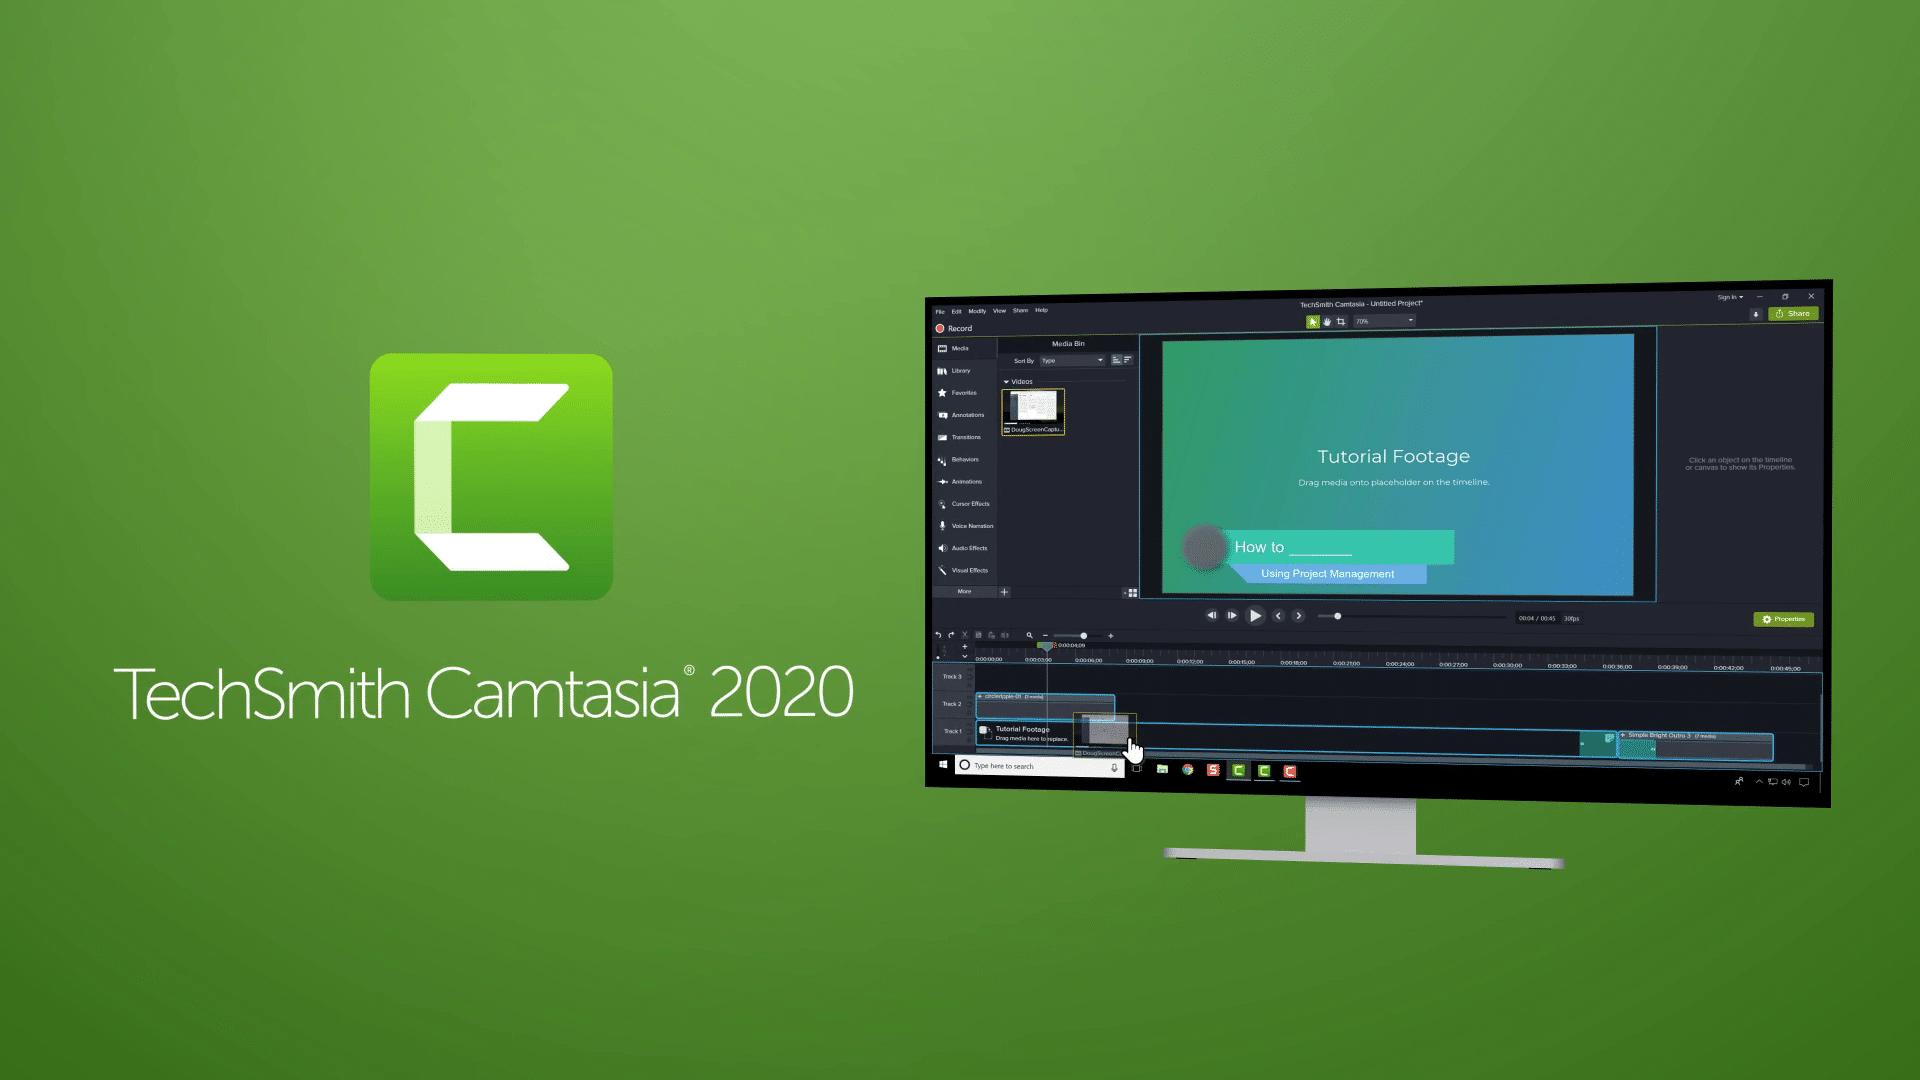 camtasia 2020 header image